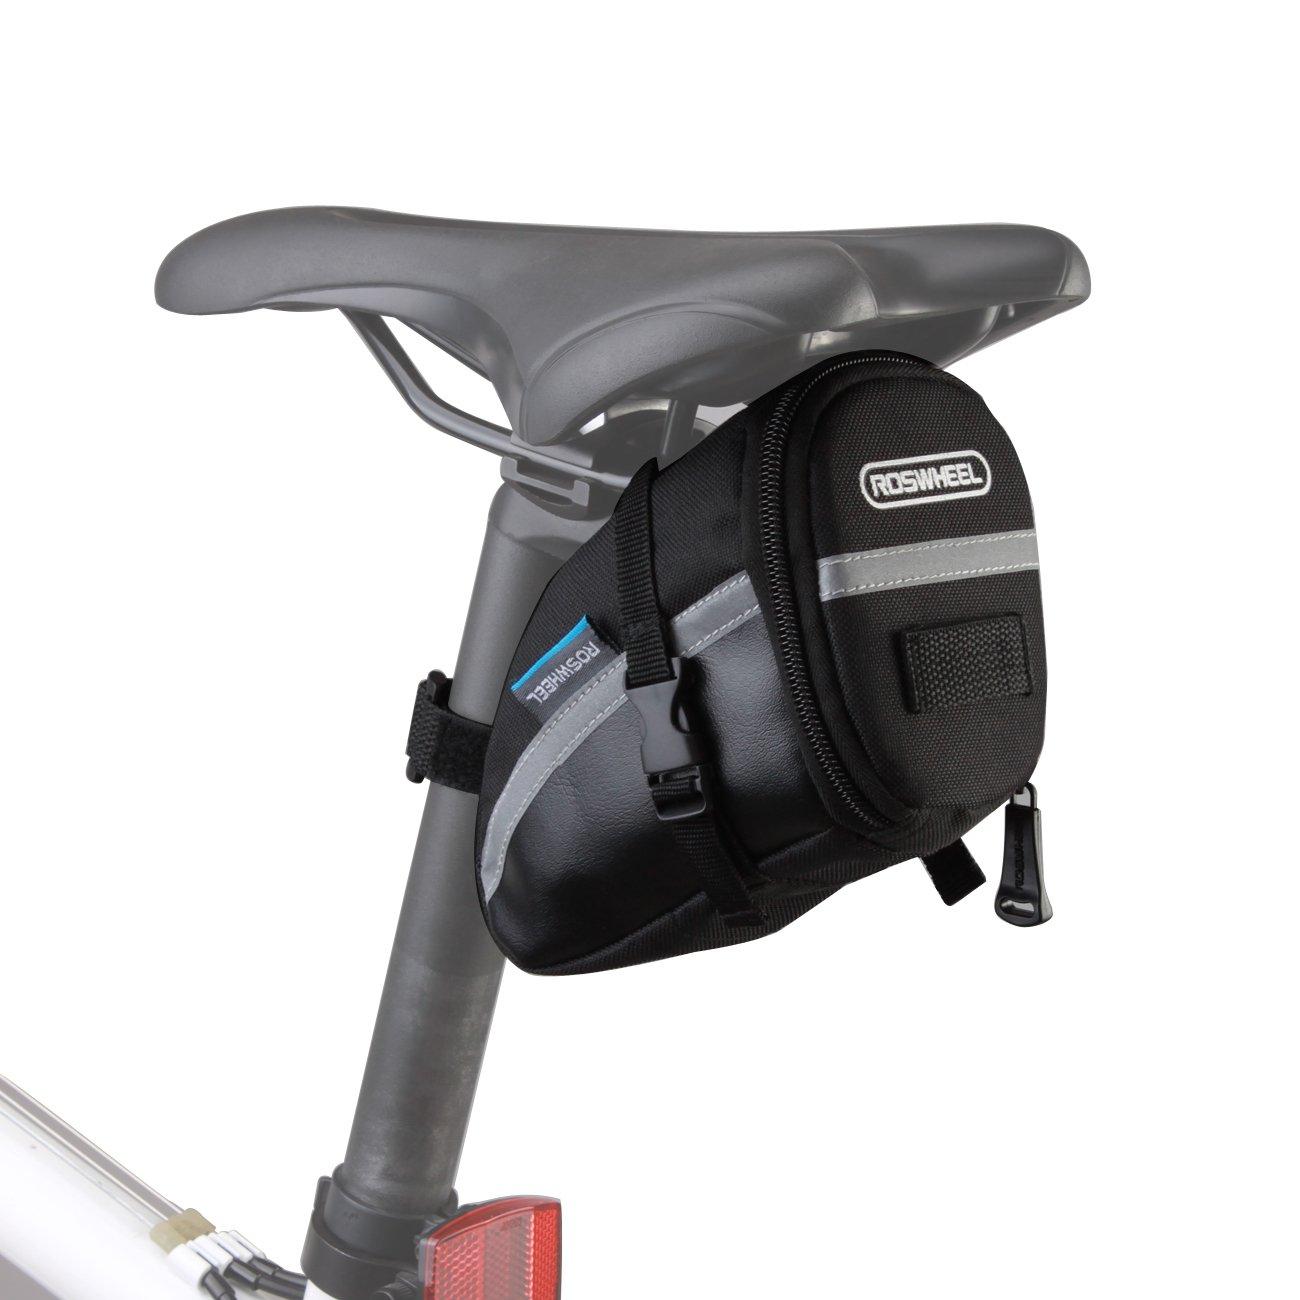 Roswheel Bolsa de sillín de bici bicicleta 15x8x9cm para bicicletas de montaña de carrera teléfonos negro: Amazon.es: Deportes y aire libre